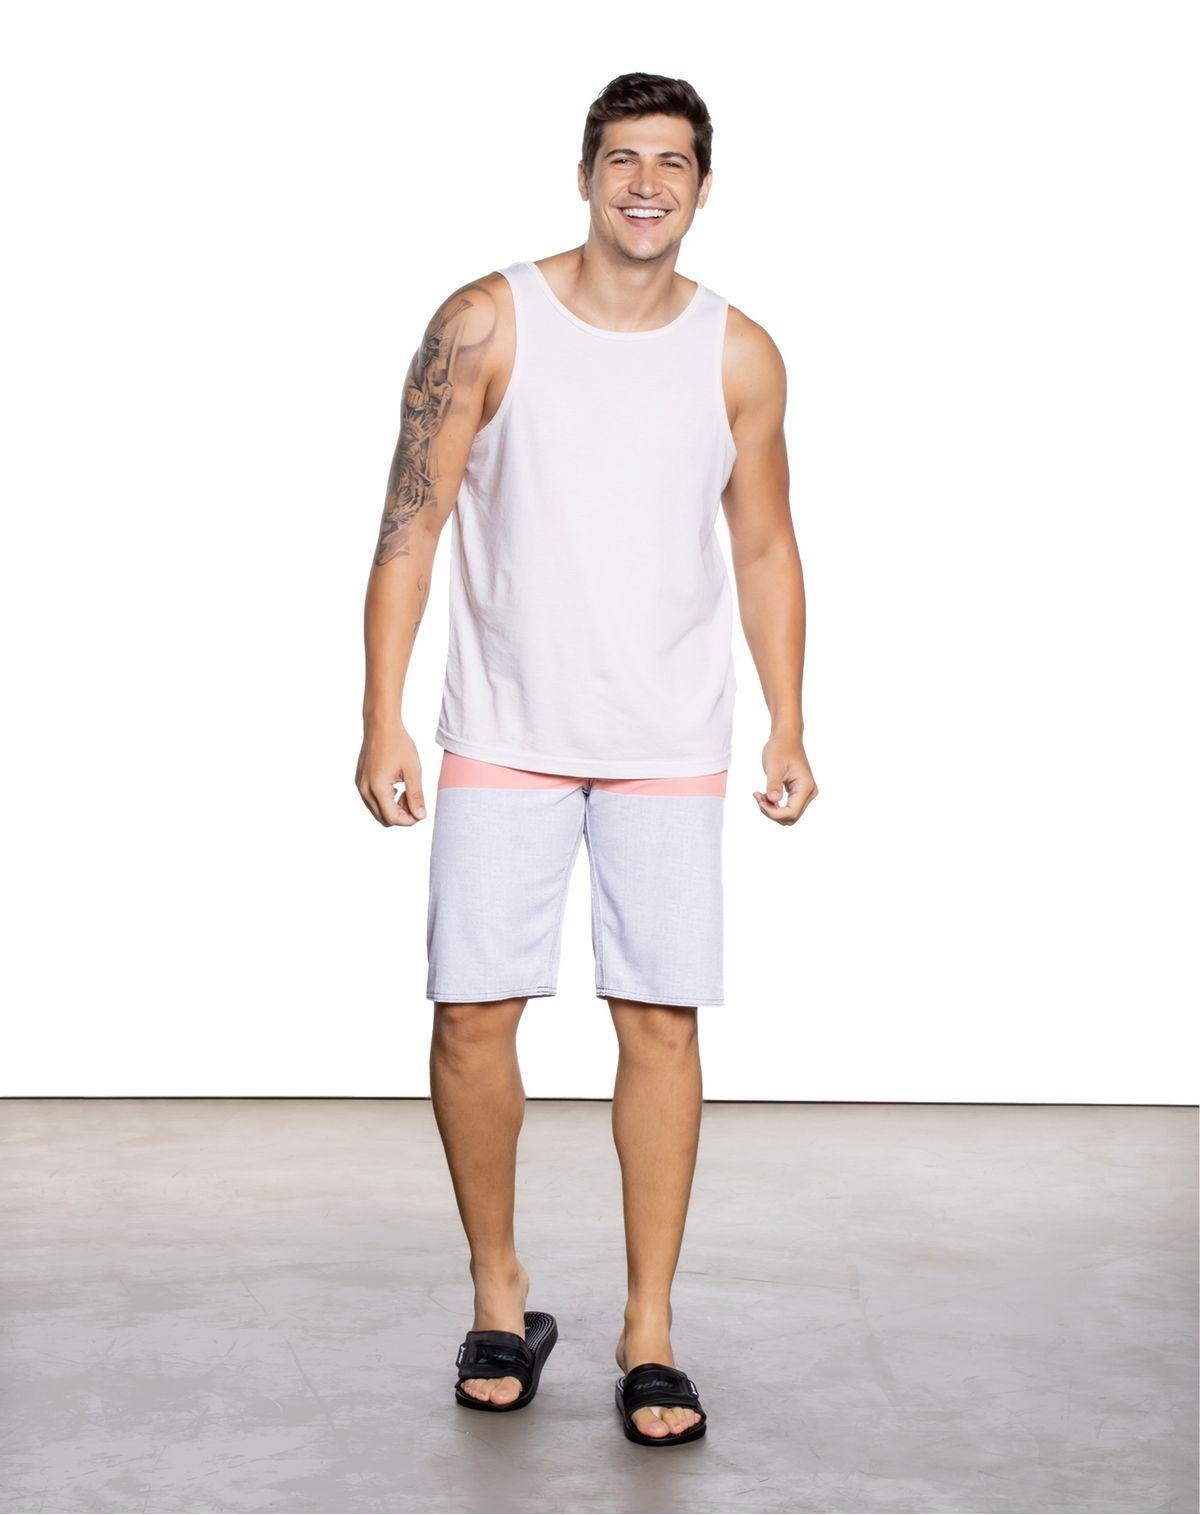 560354005-bermuda-masculina-surf-estampada-marinho-rosa-44-a09